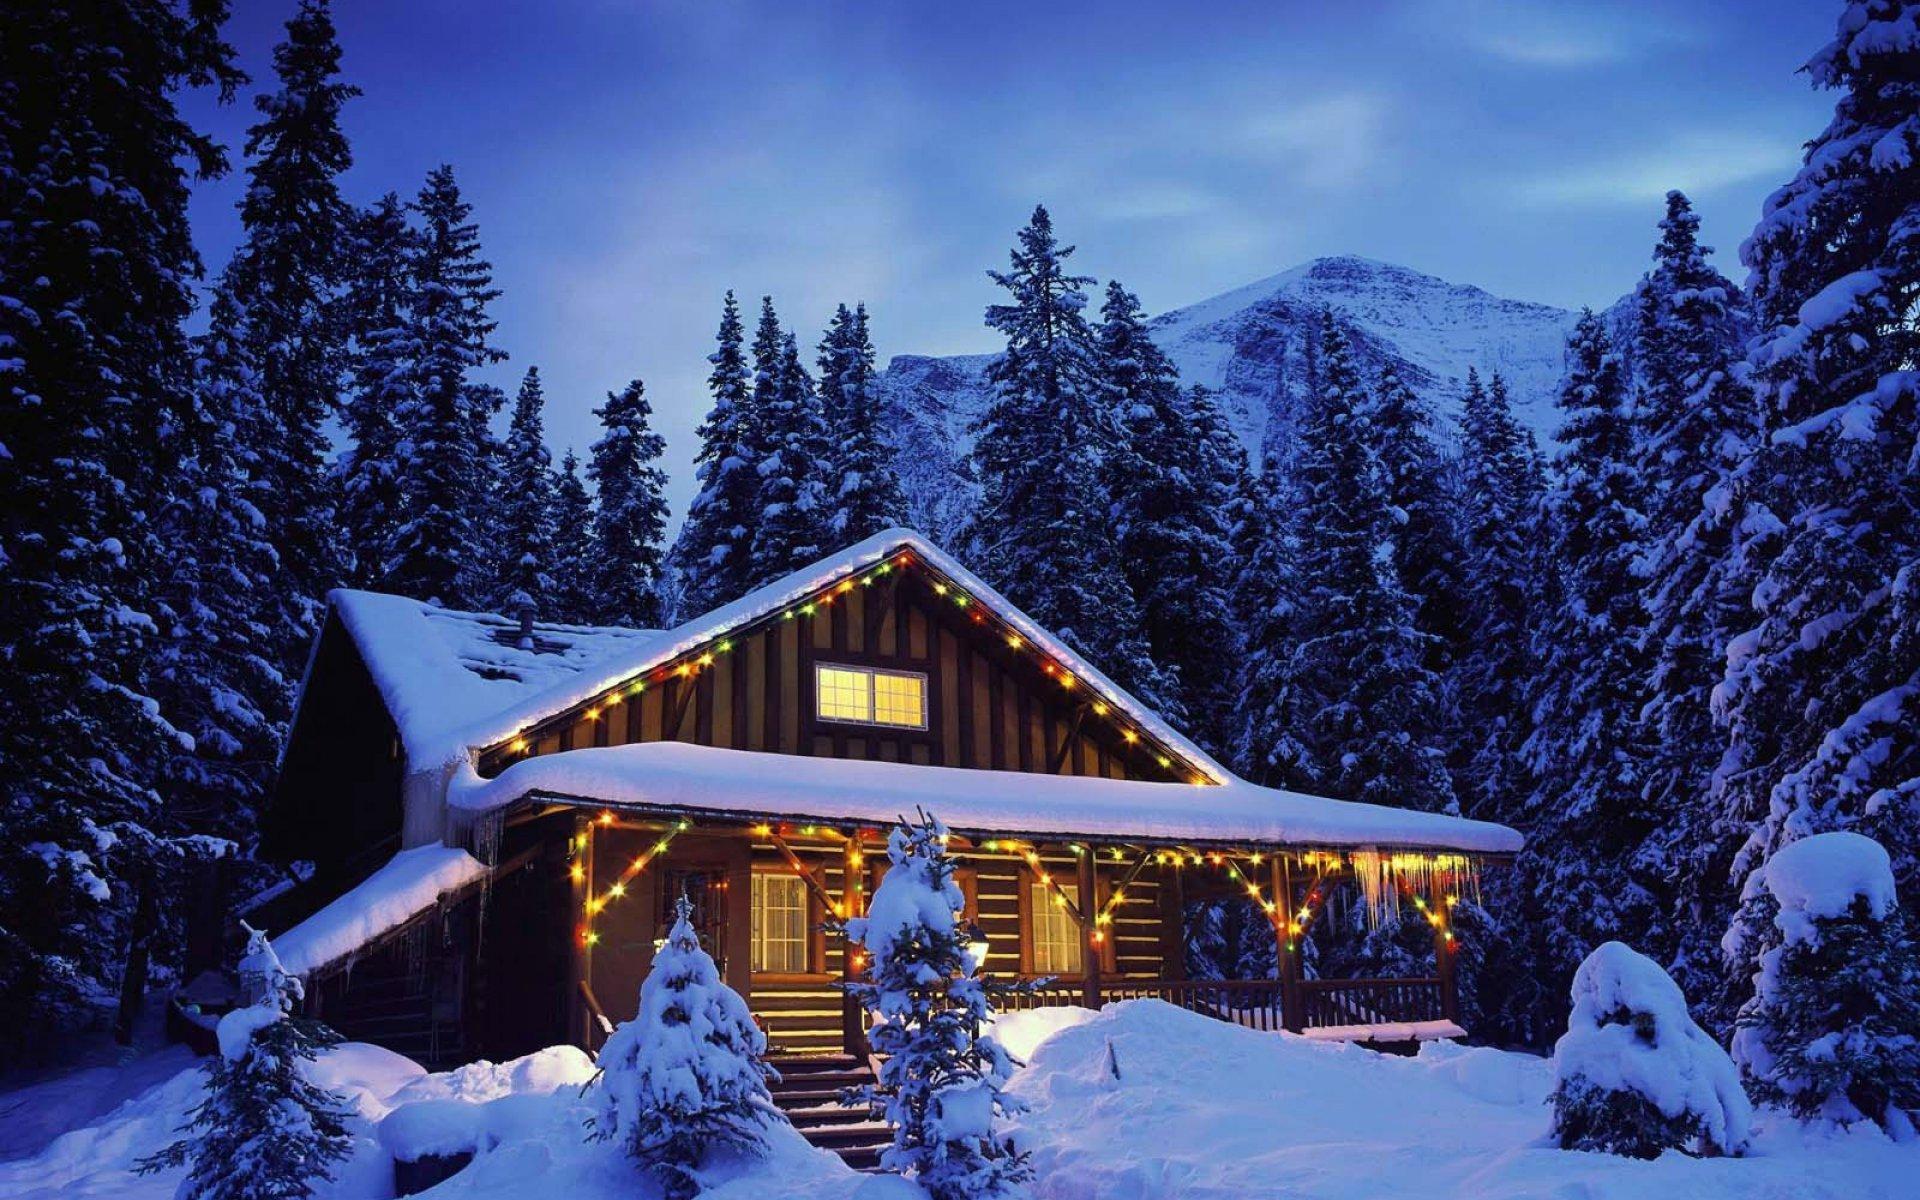 christmas cabin wallpaper 719562